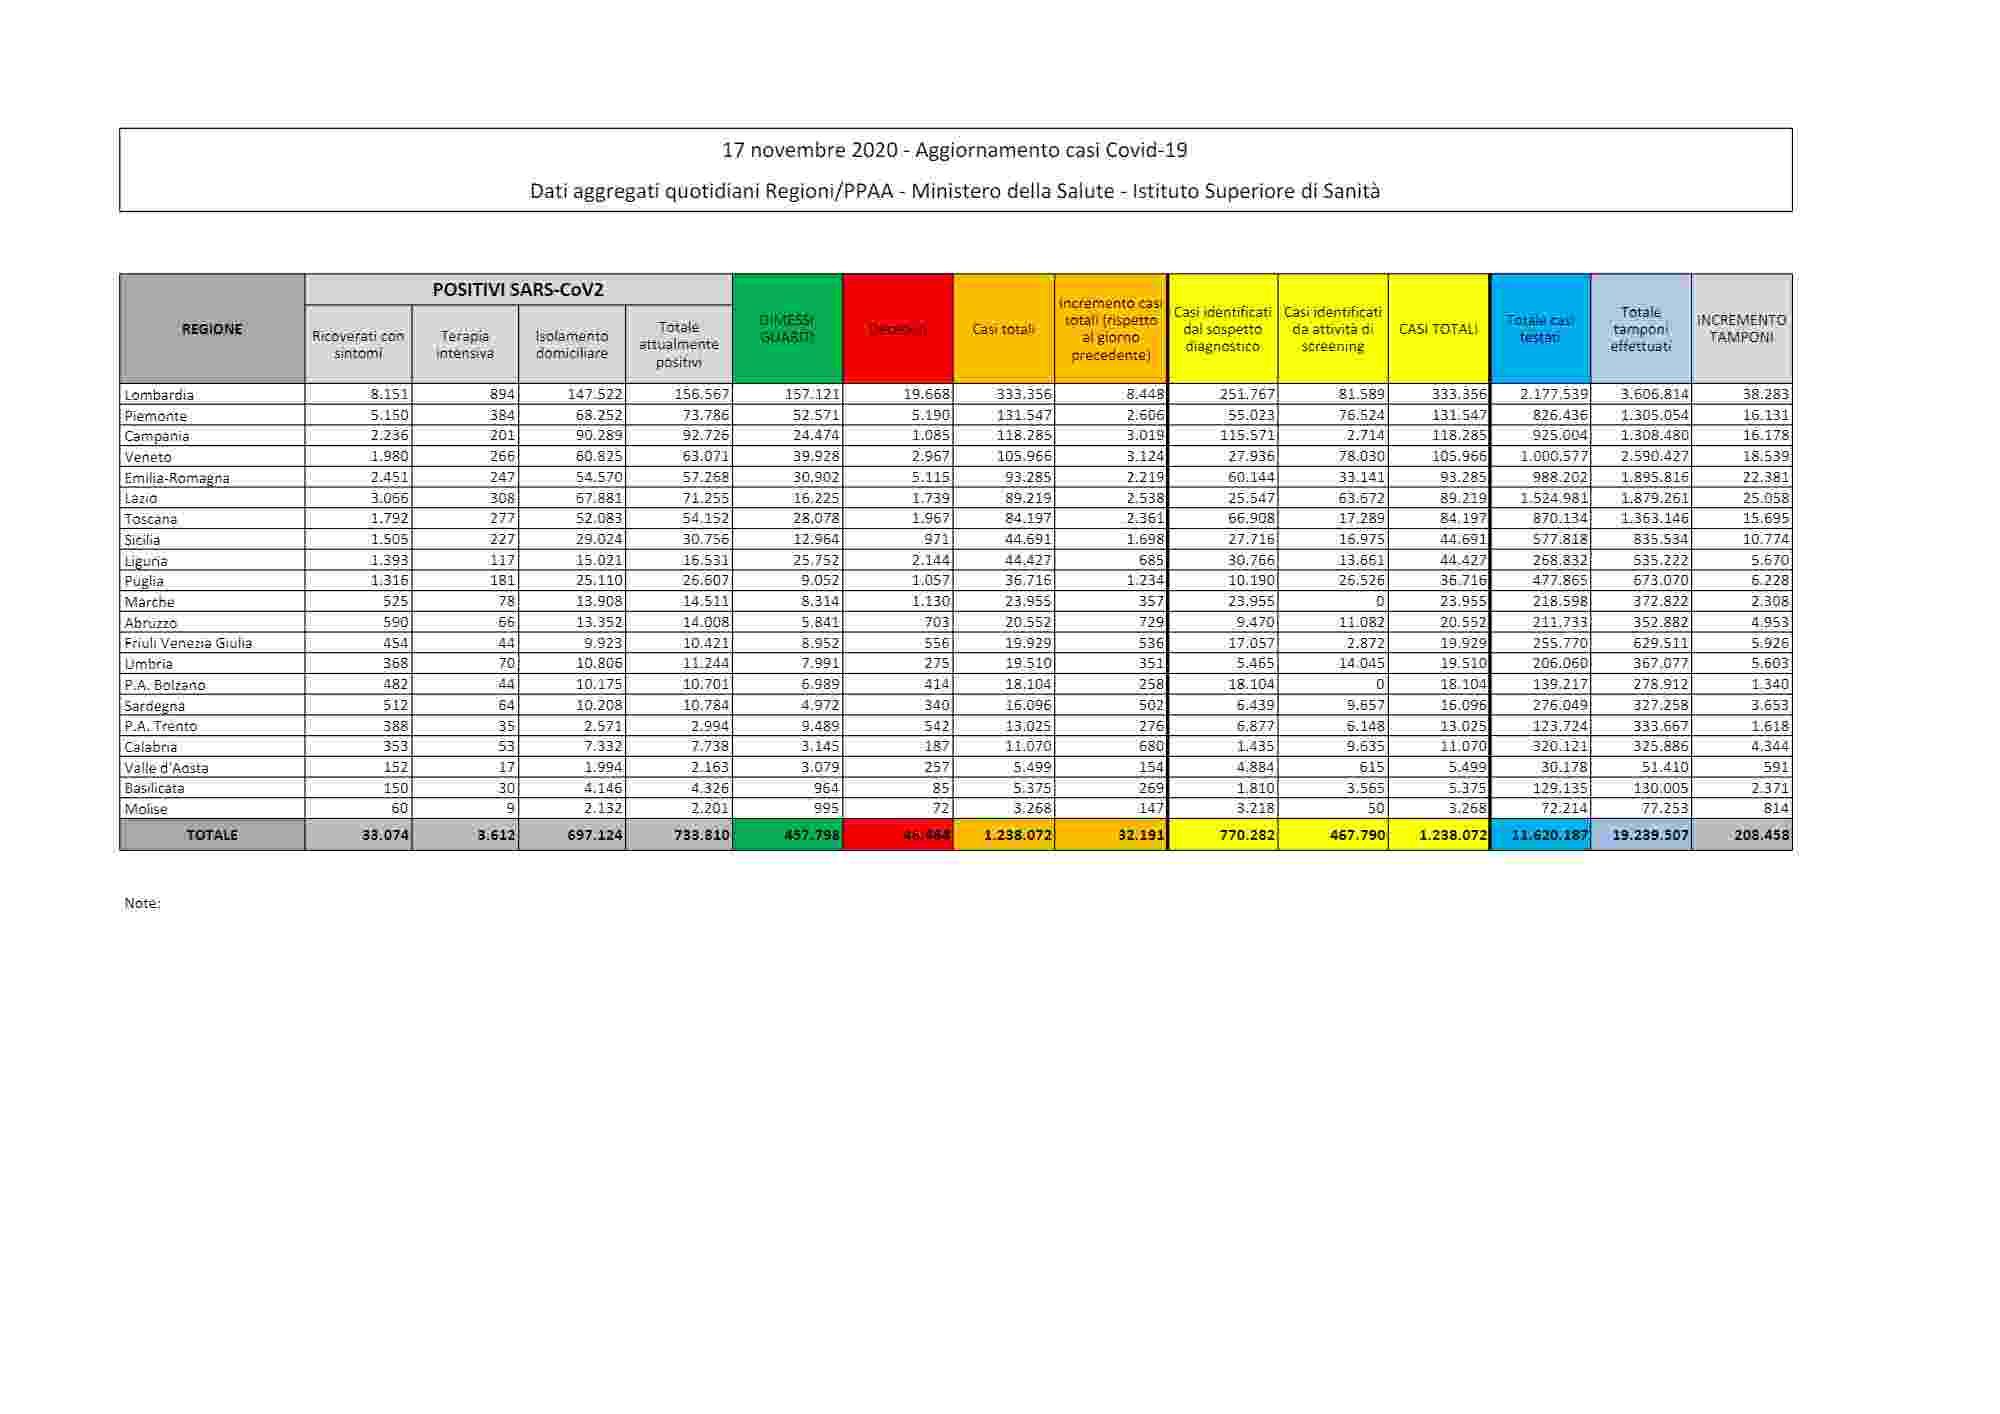 Coronavirus: in Italia 32.191 nuovi casi e 731 decessi in 24 ore